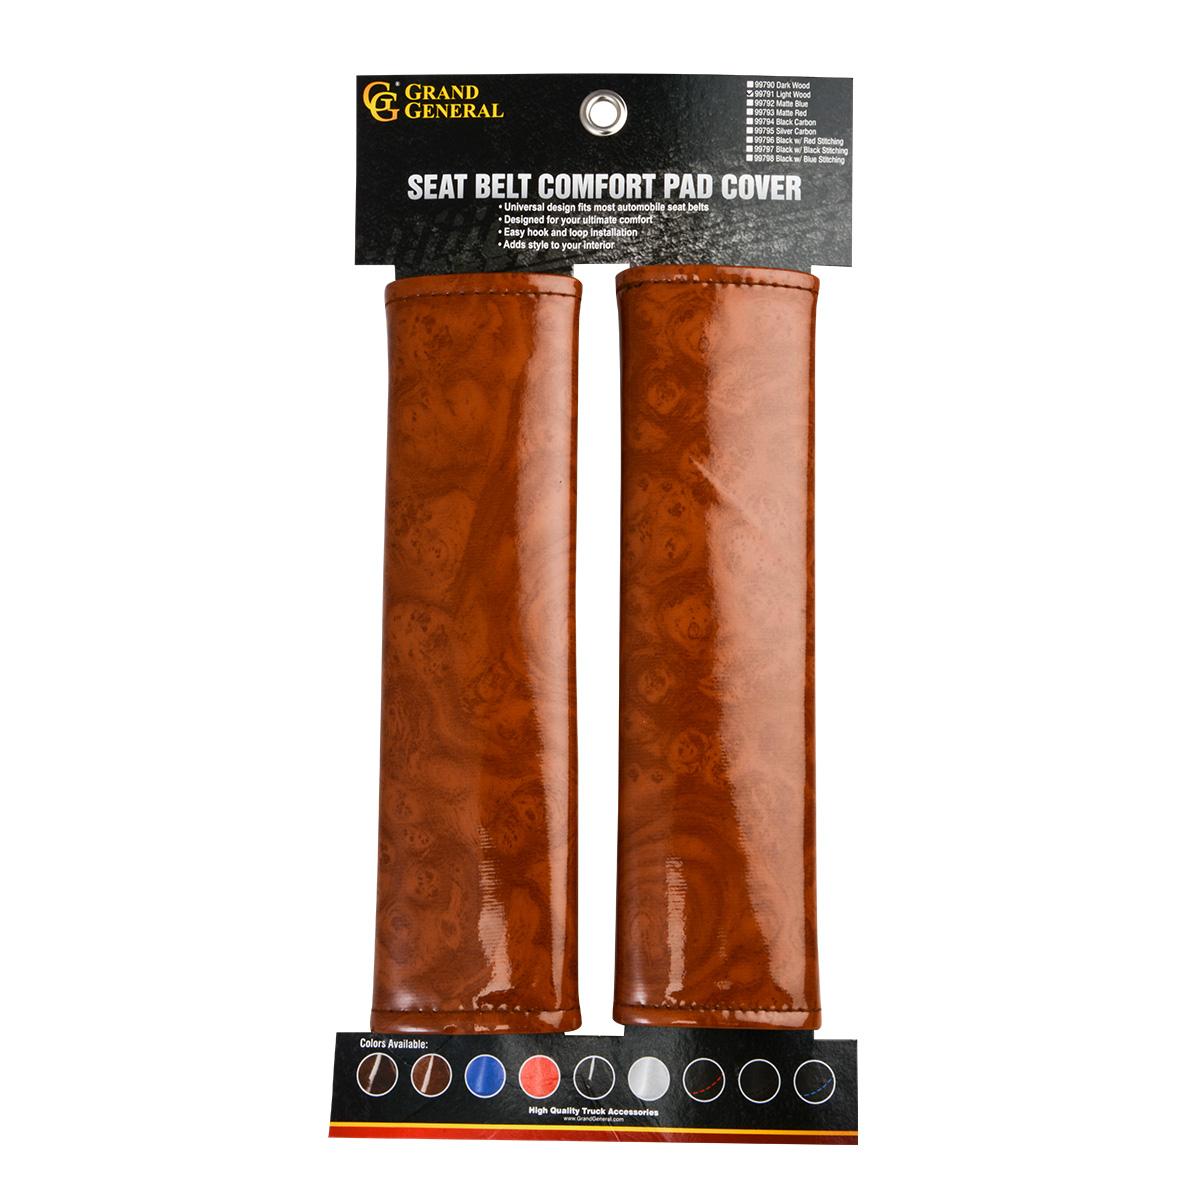 Seat Belt Comfort Pad Cover - Light Wood Packaging